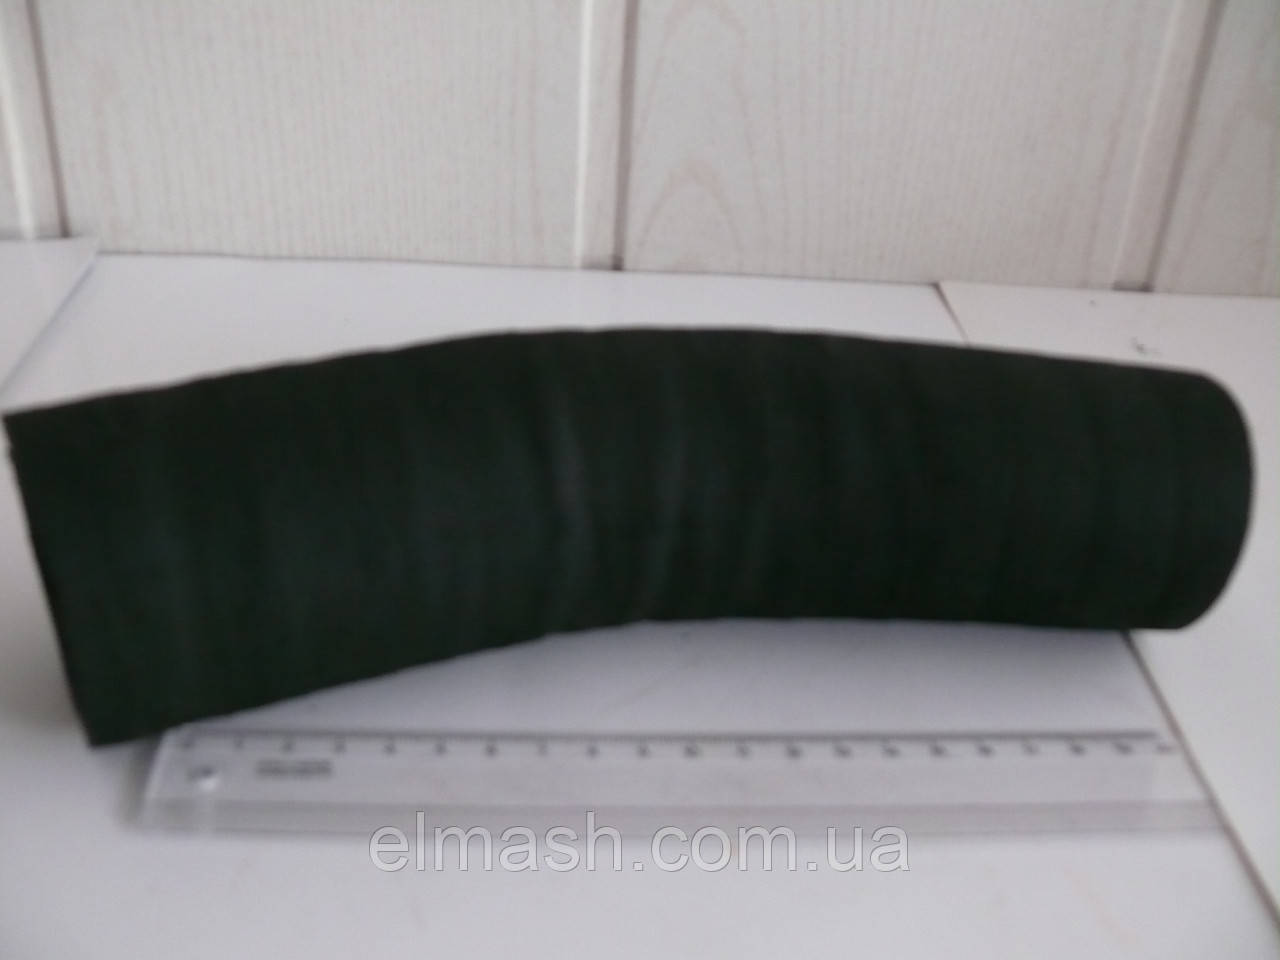 Рукав радиатора верхн. подводящ. d 58(13+6+изгиб) КАМАЗ (пр-во БРТ)